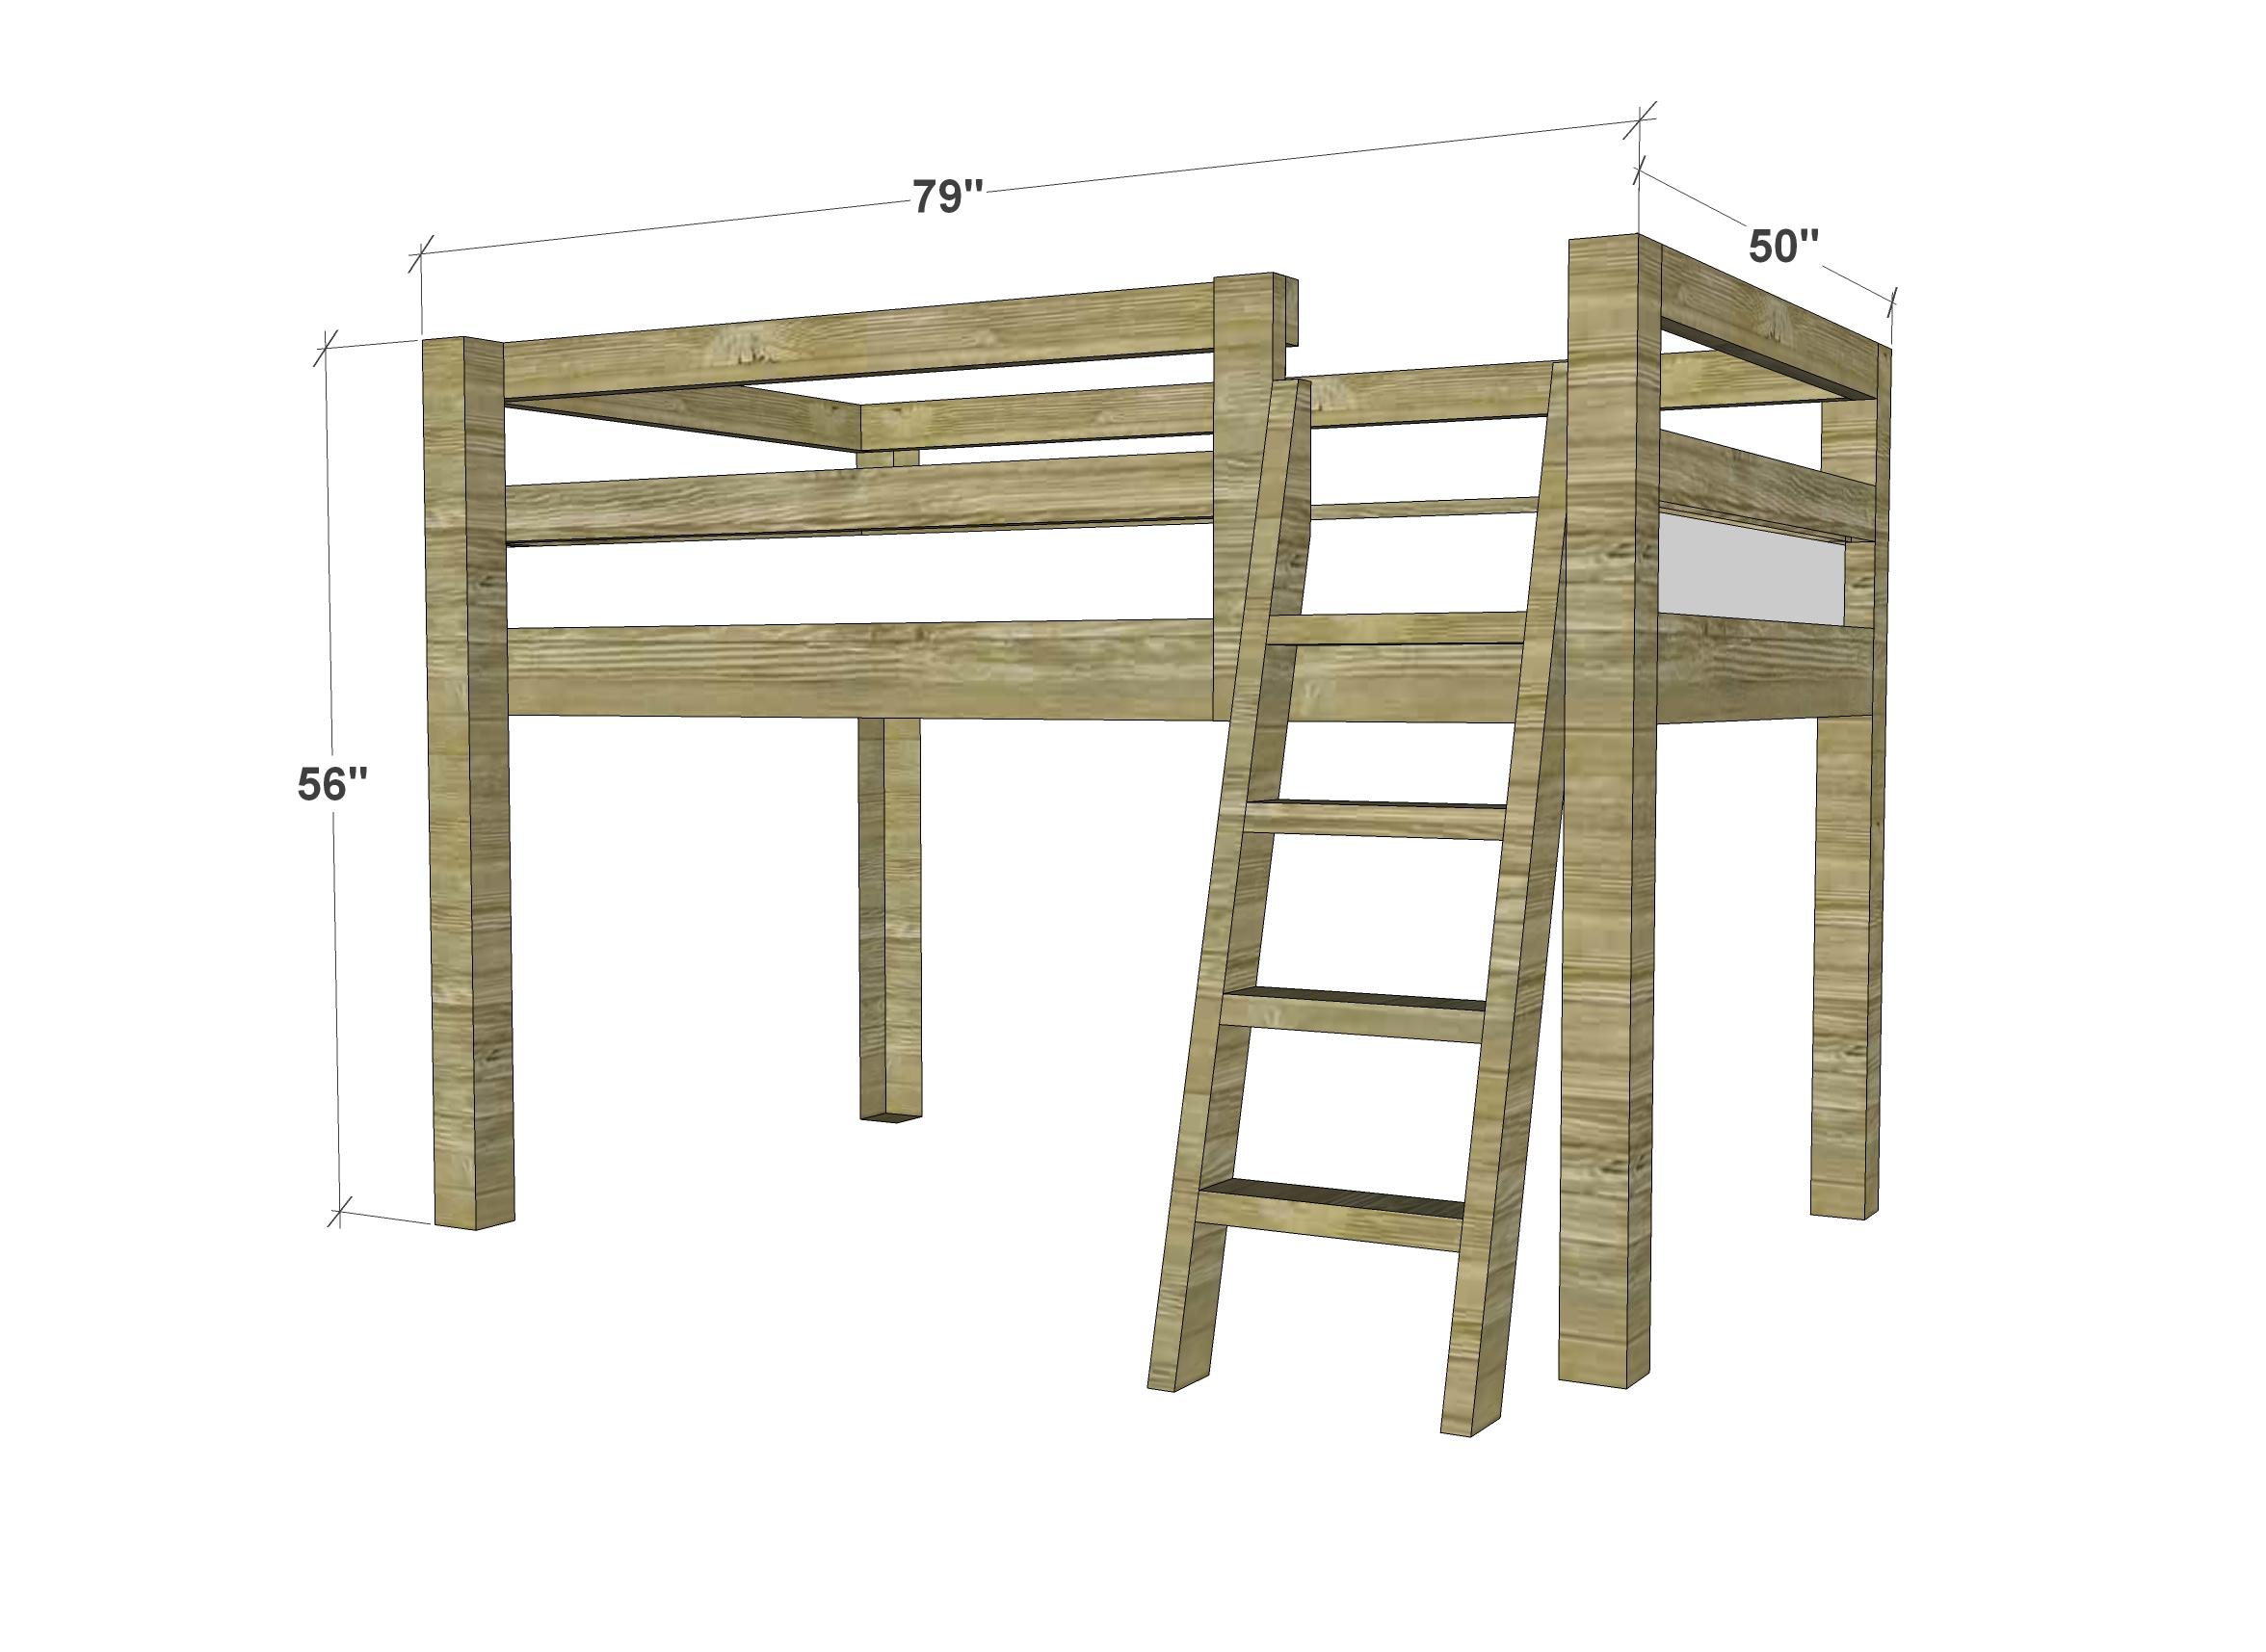 Childrens Loft Bed Plans